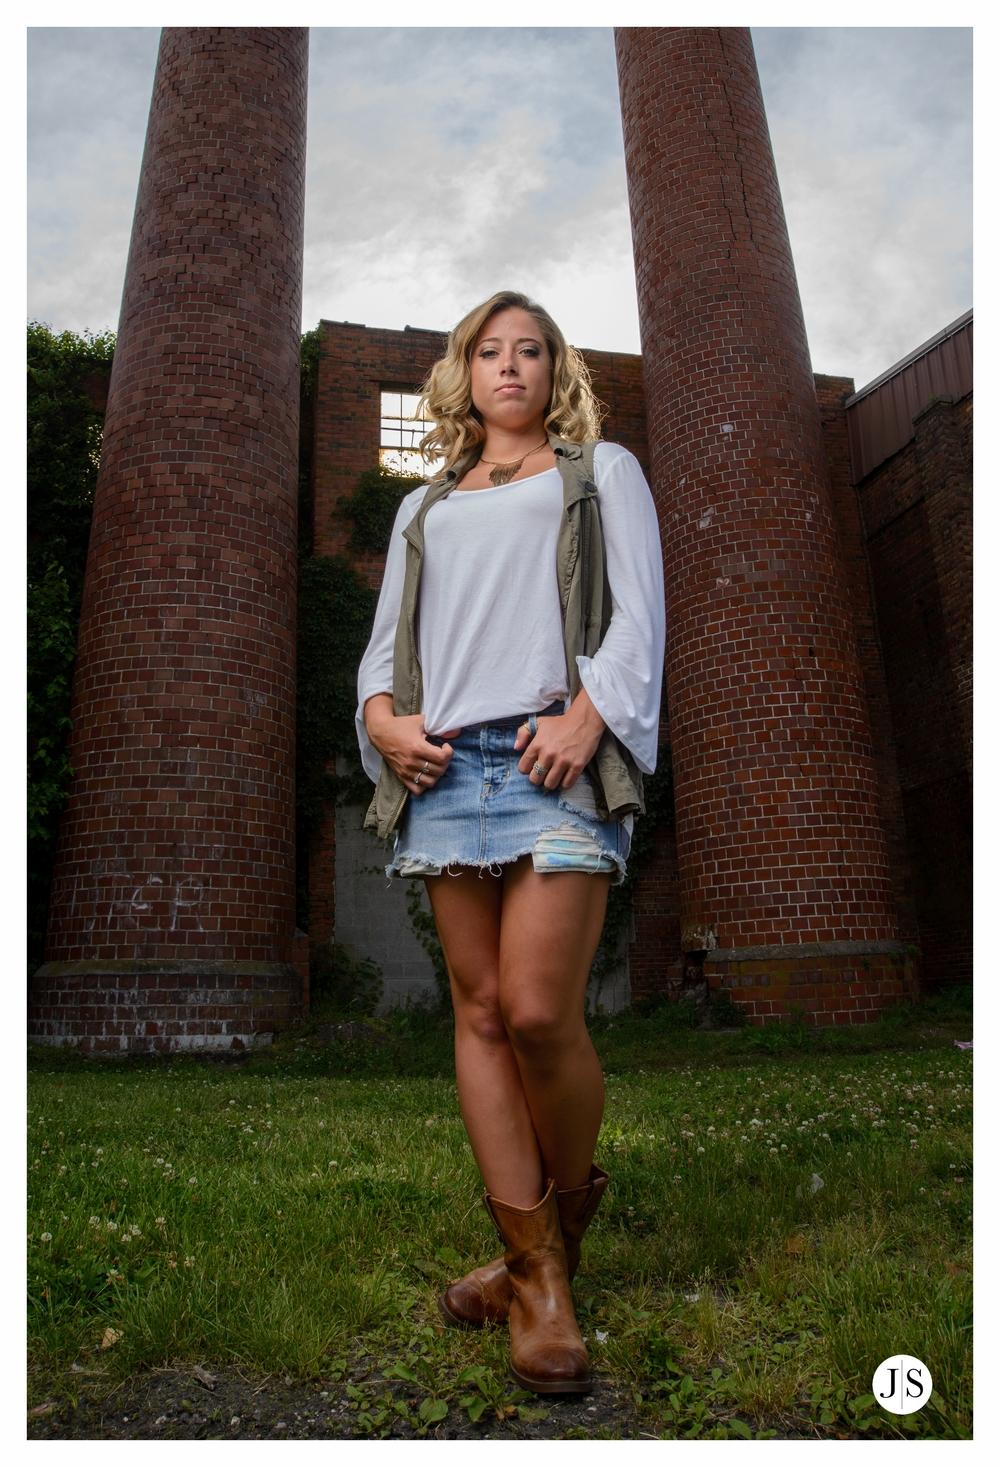 Kayla wells blog collage 4.jpg